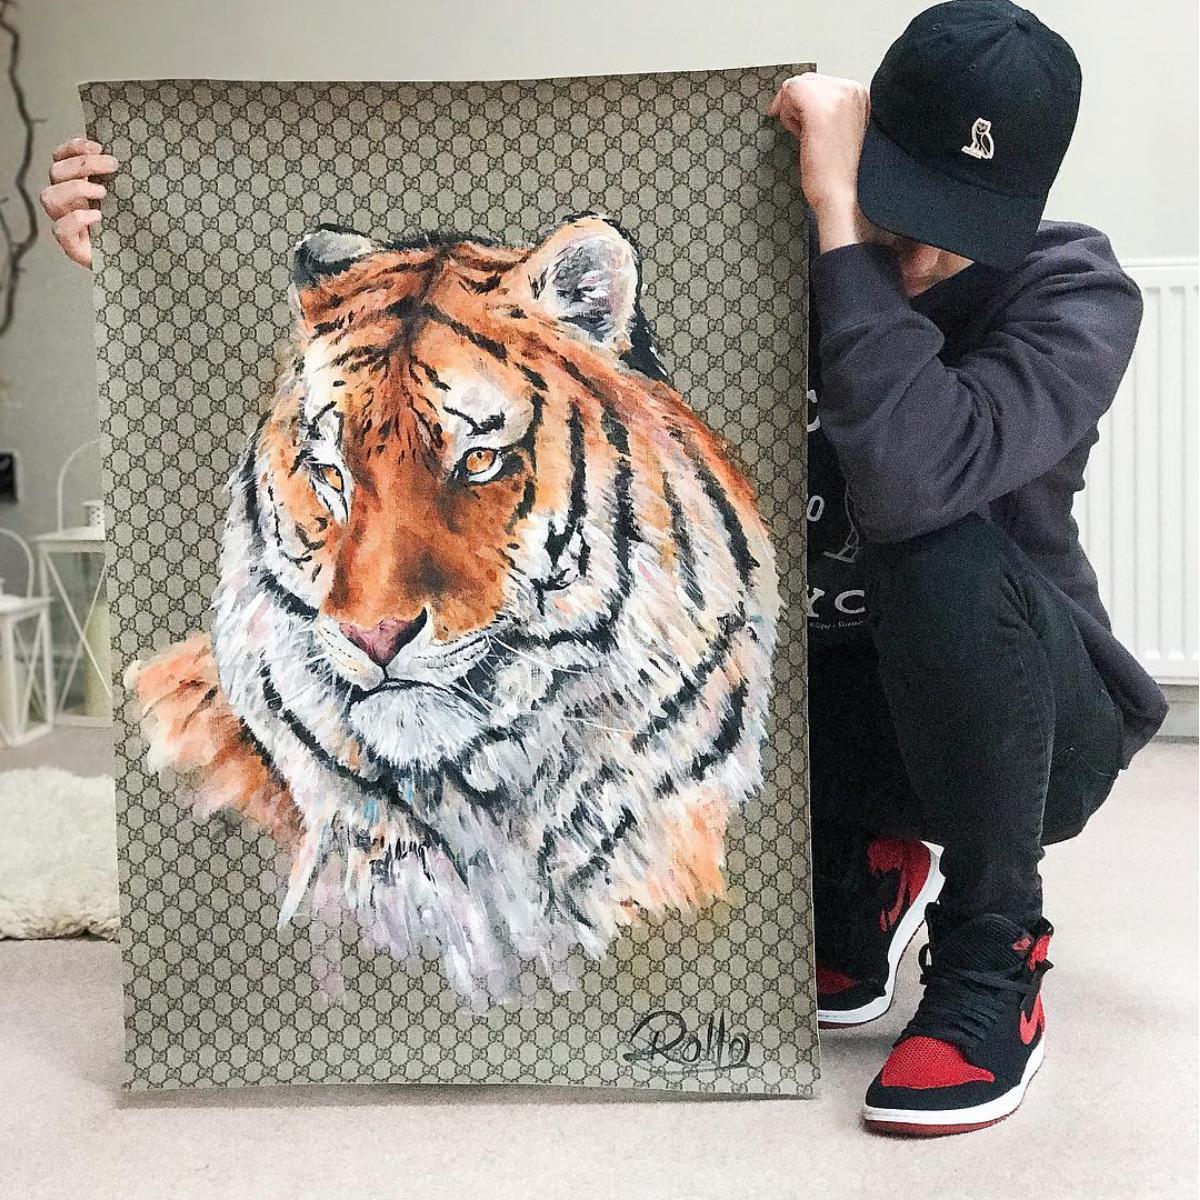 Gucci Tiger.